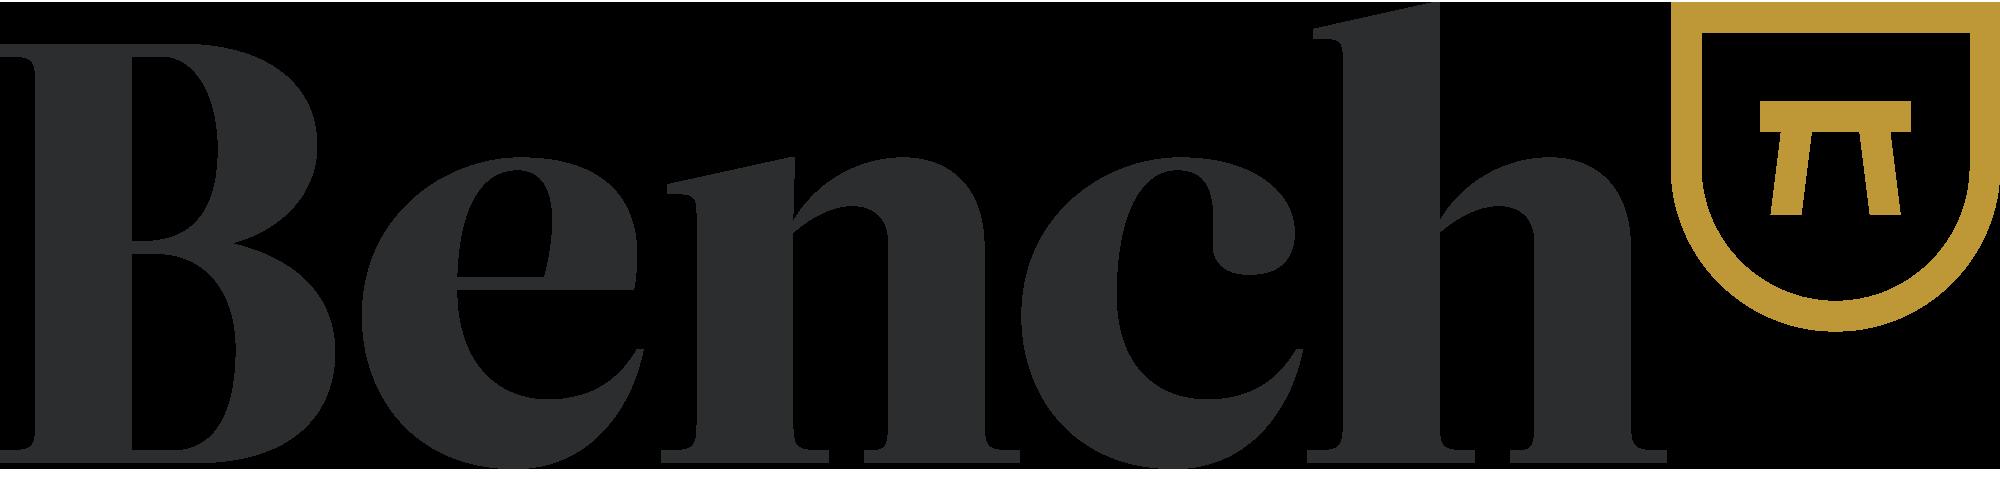 Bench+logo-gold